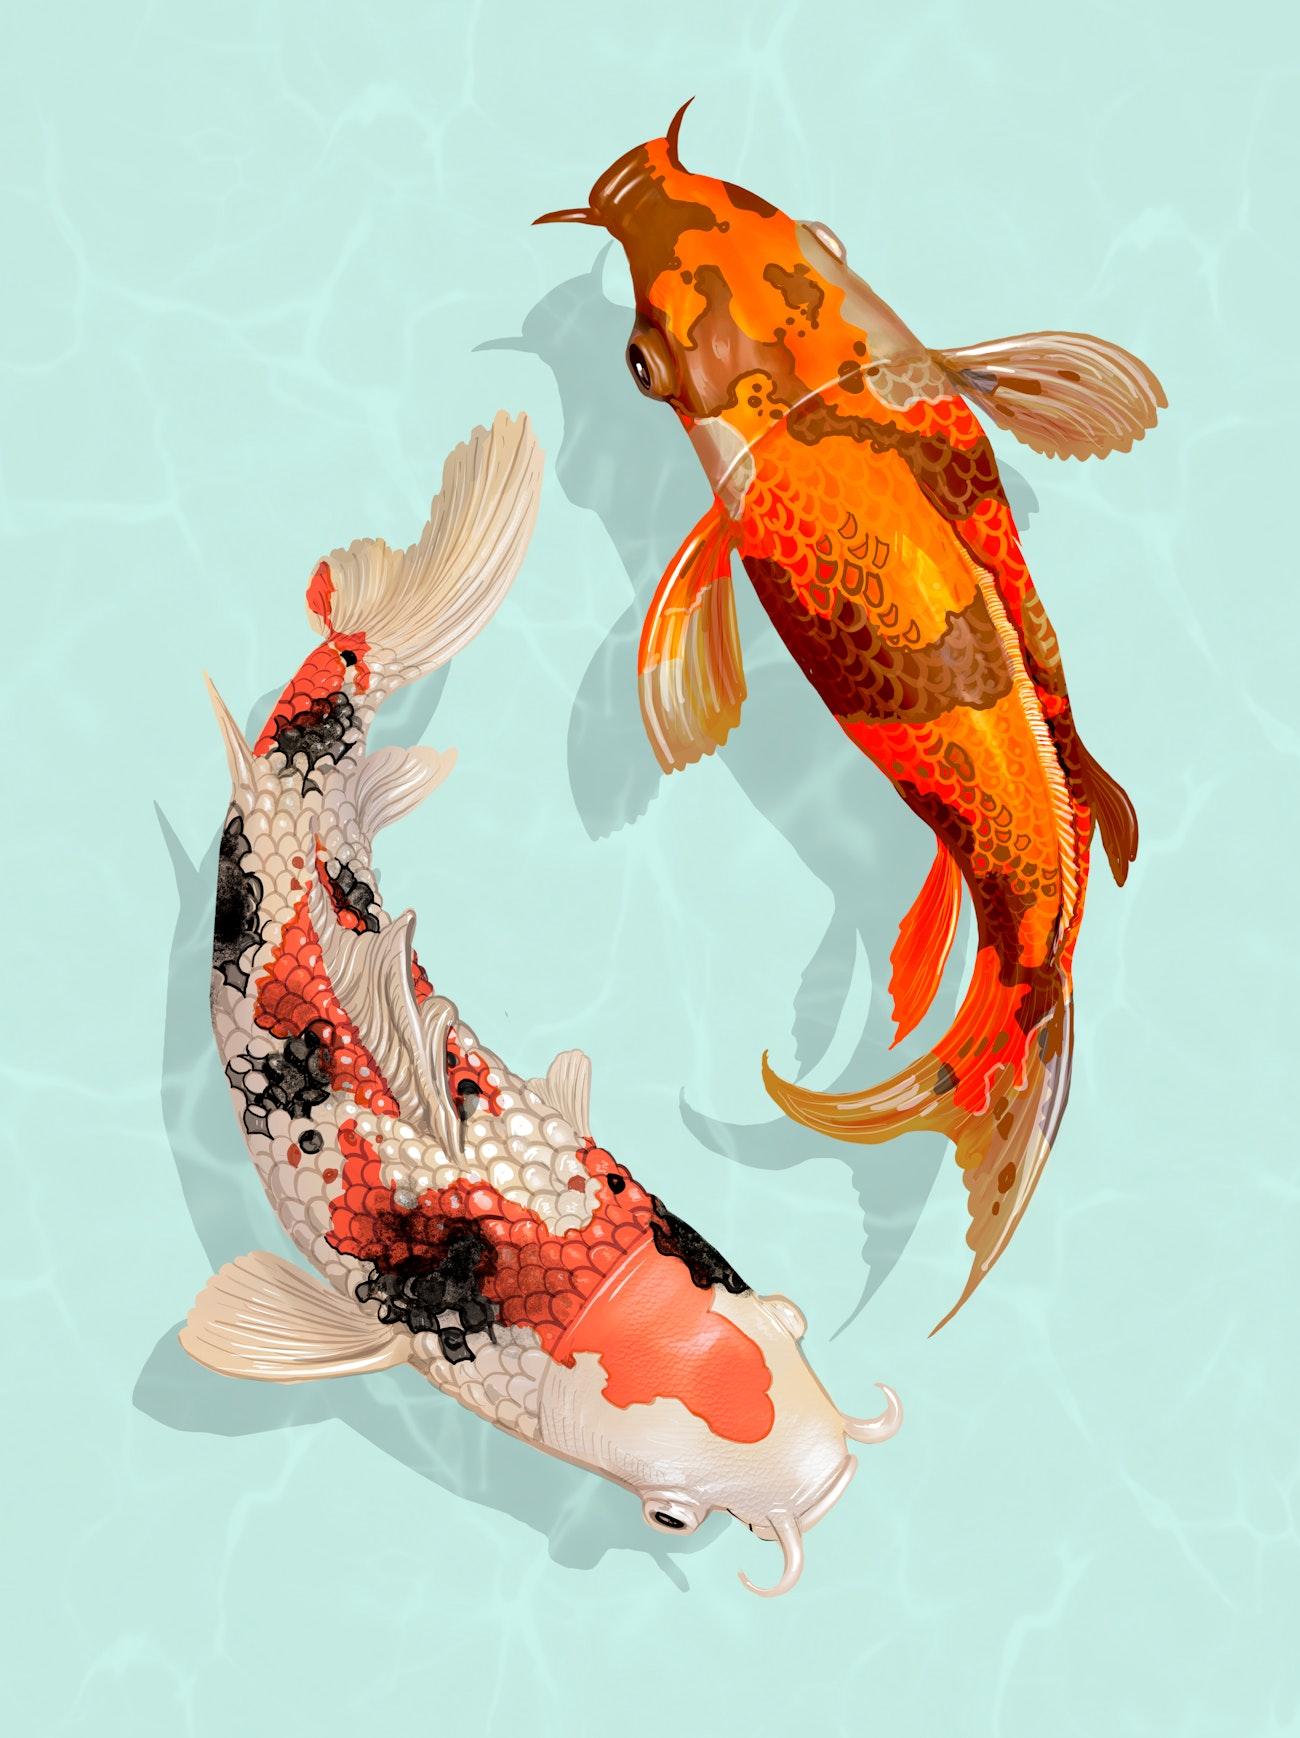 Two Japanese Koi Fish Swimming Royalty Free Illustration 449871